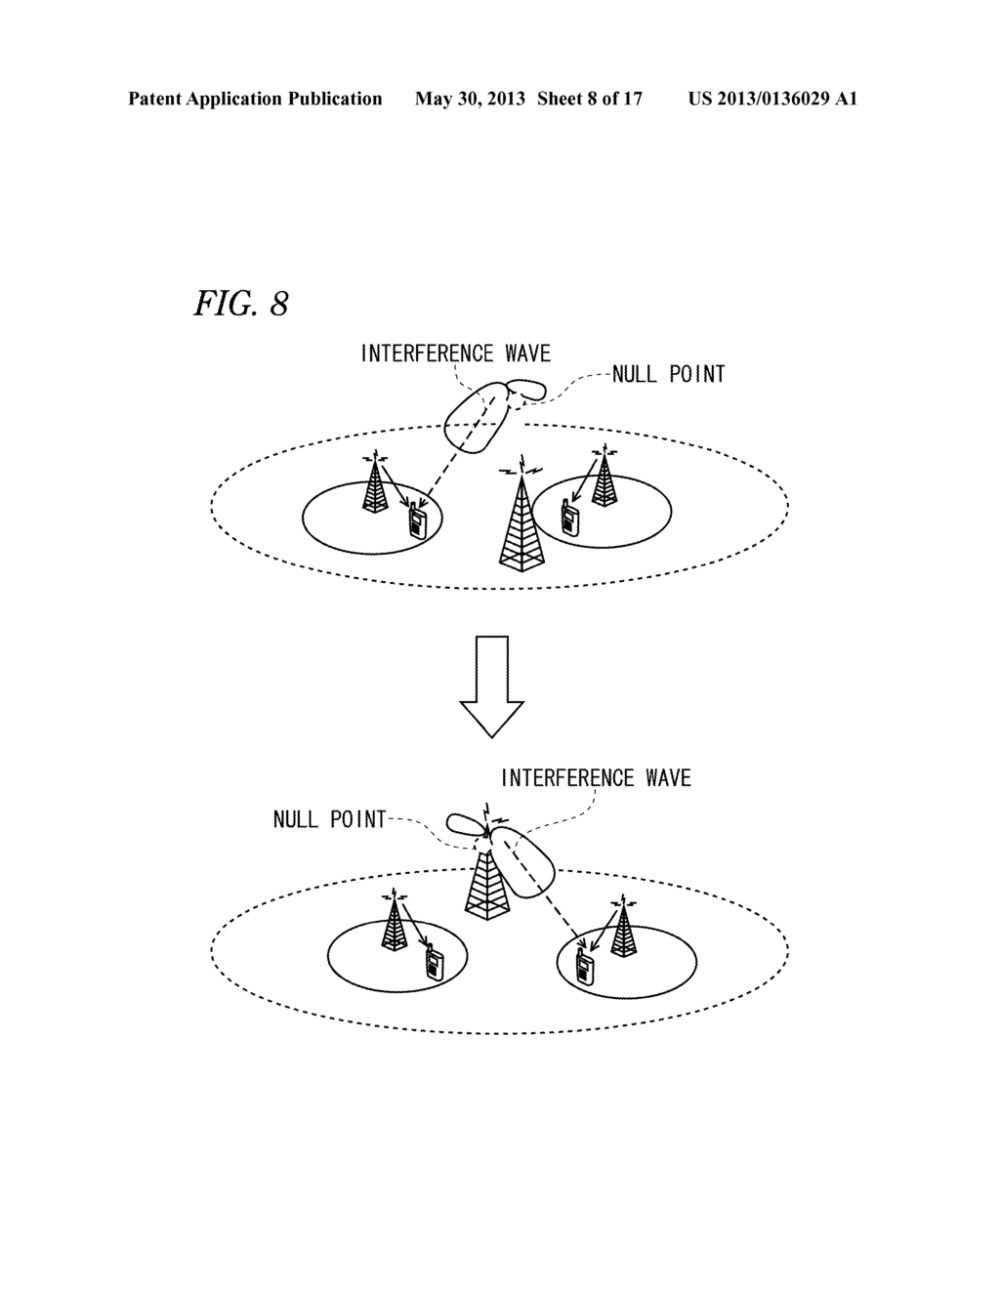 medium resolution of wireless communication system low transmission power cell base station macrocell base station wireless terminal and load distribution method diagram